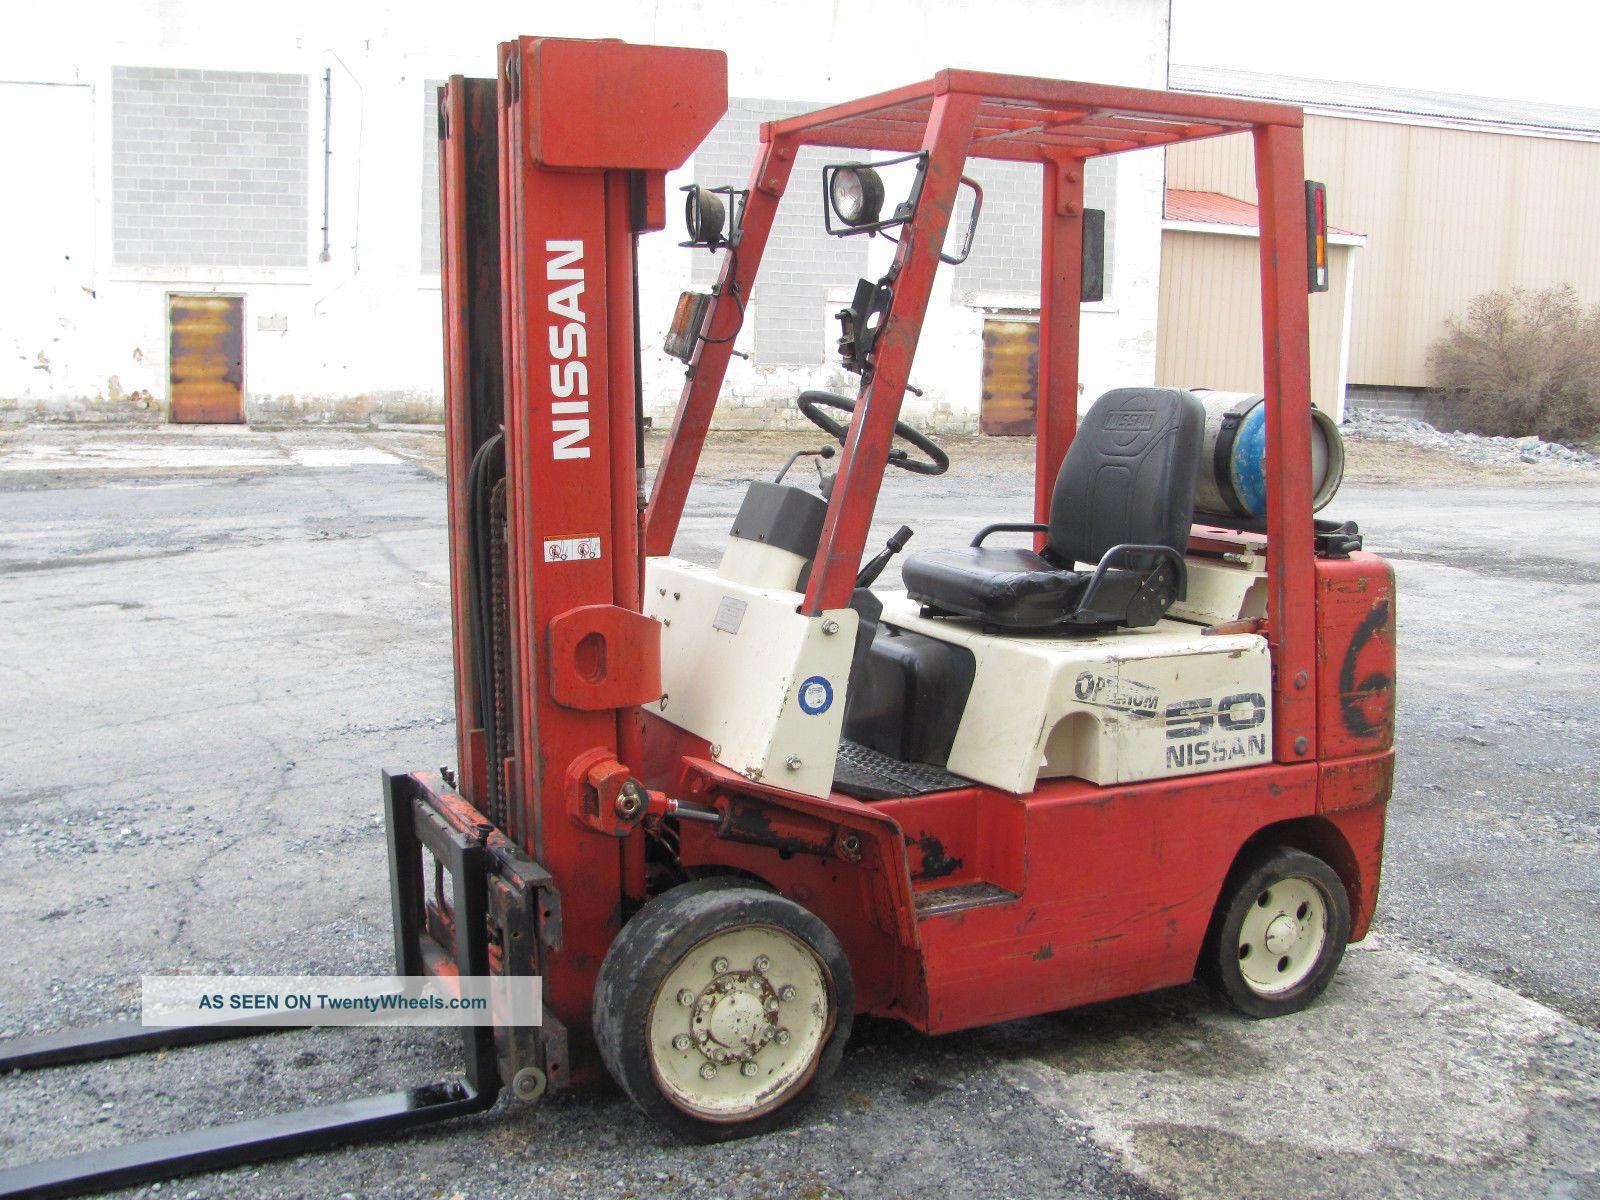 Four Way Side Loader Forklift Mitsubishi Rbm2025k Series: 1999 Nissan 50 Cushion Forklift, Optimum Series, Three